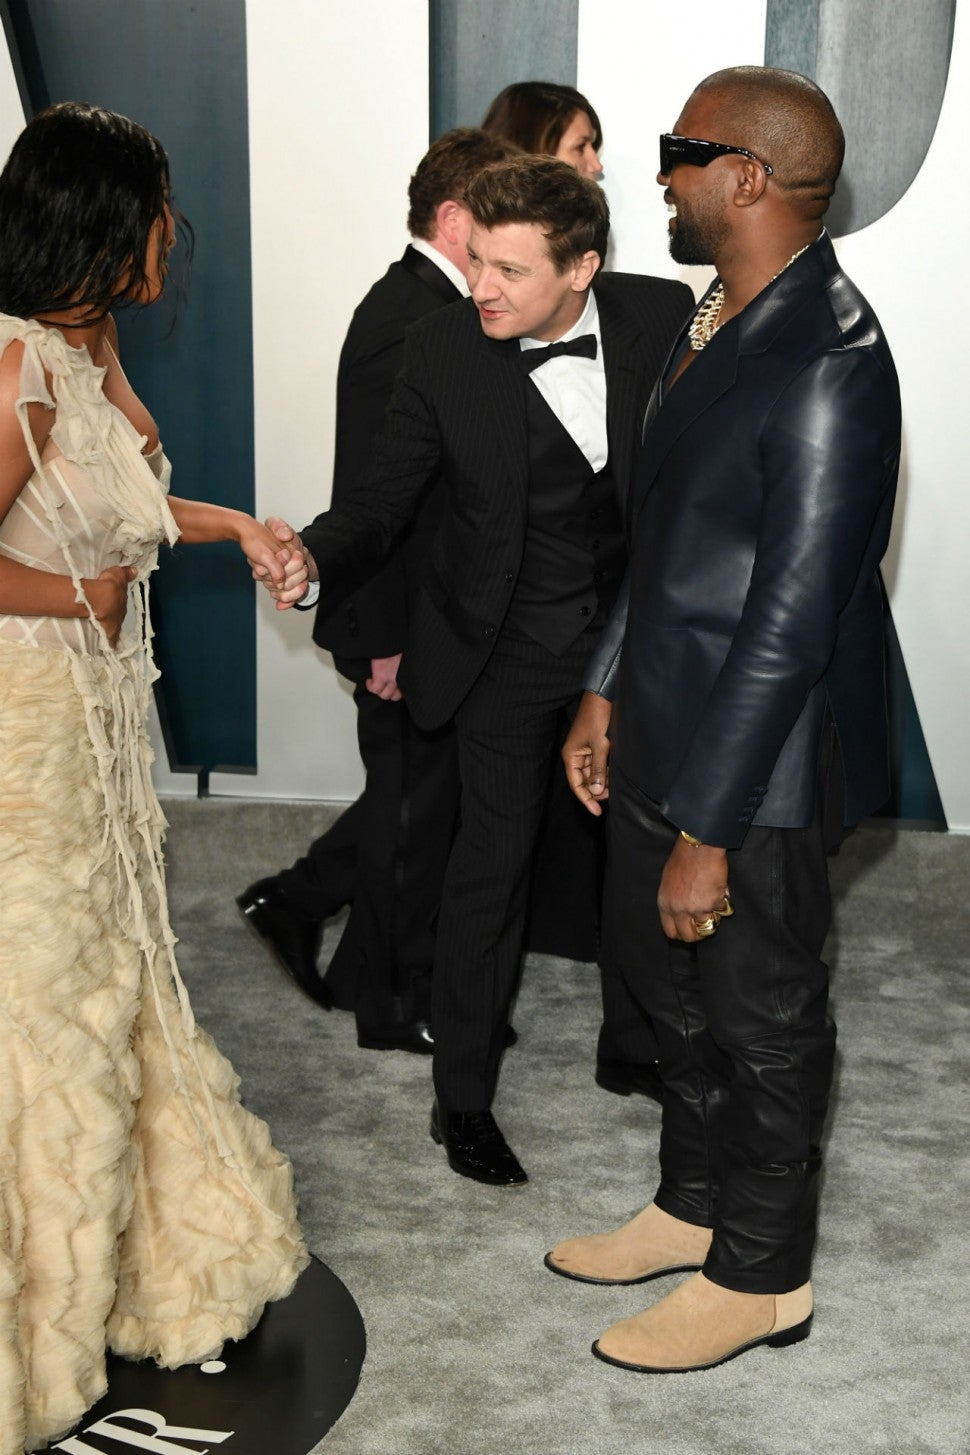 Kim Kardashian, Kanye West, Jeremy Renner